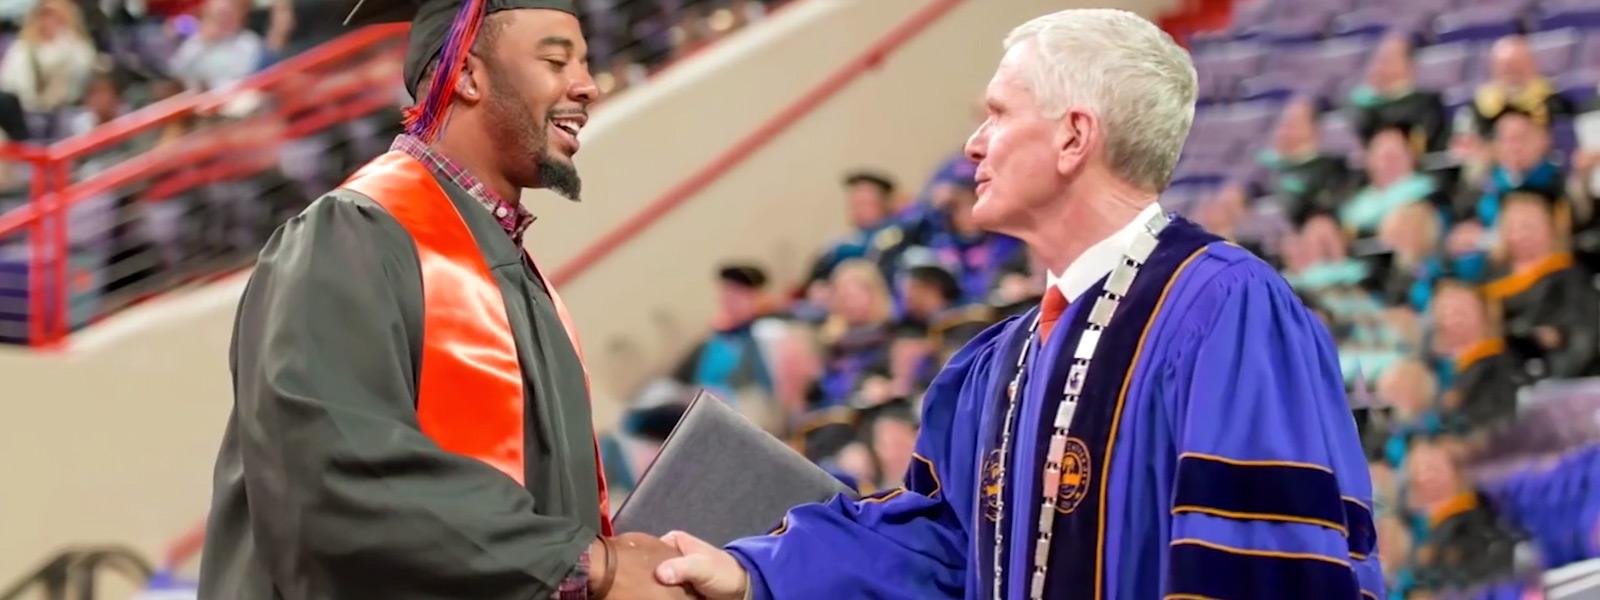 Clemson student graduating shakes professor's hand.